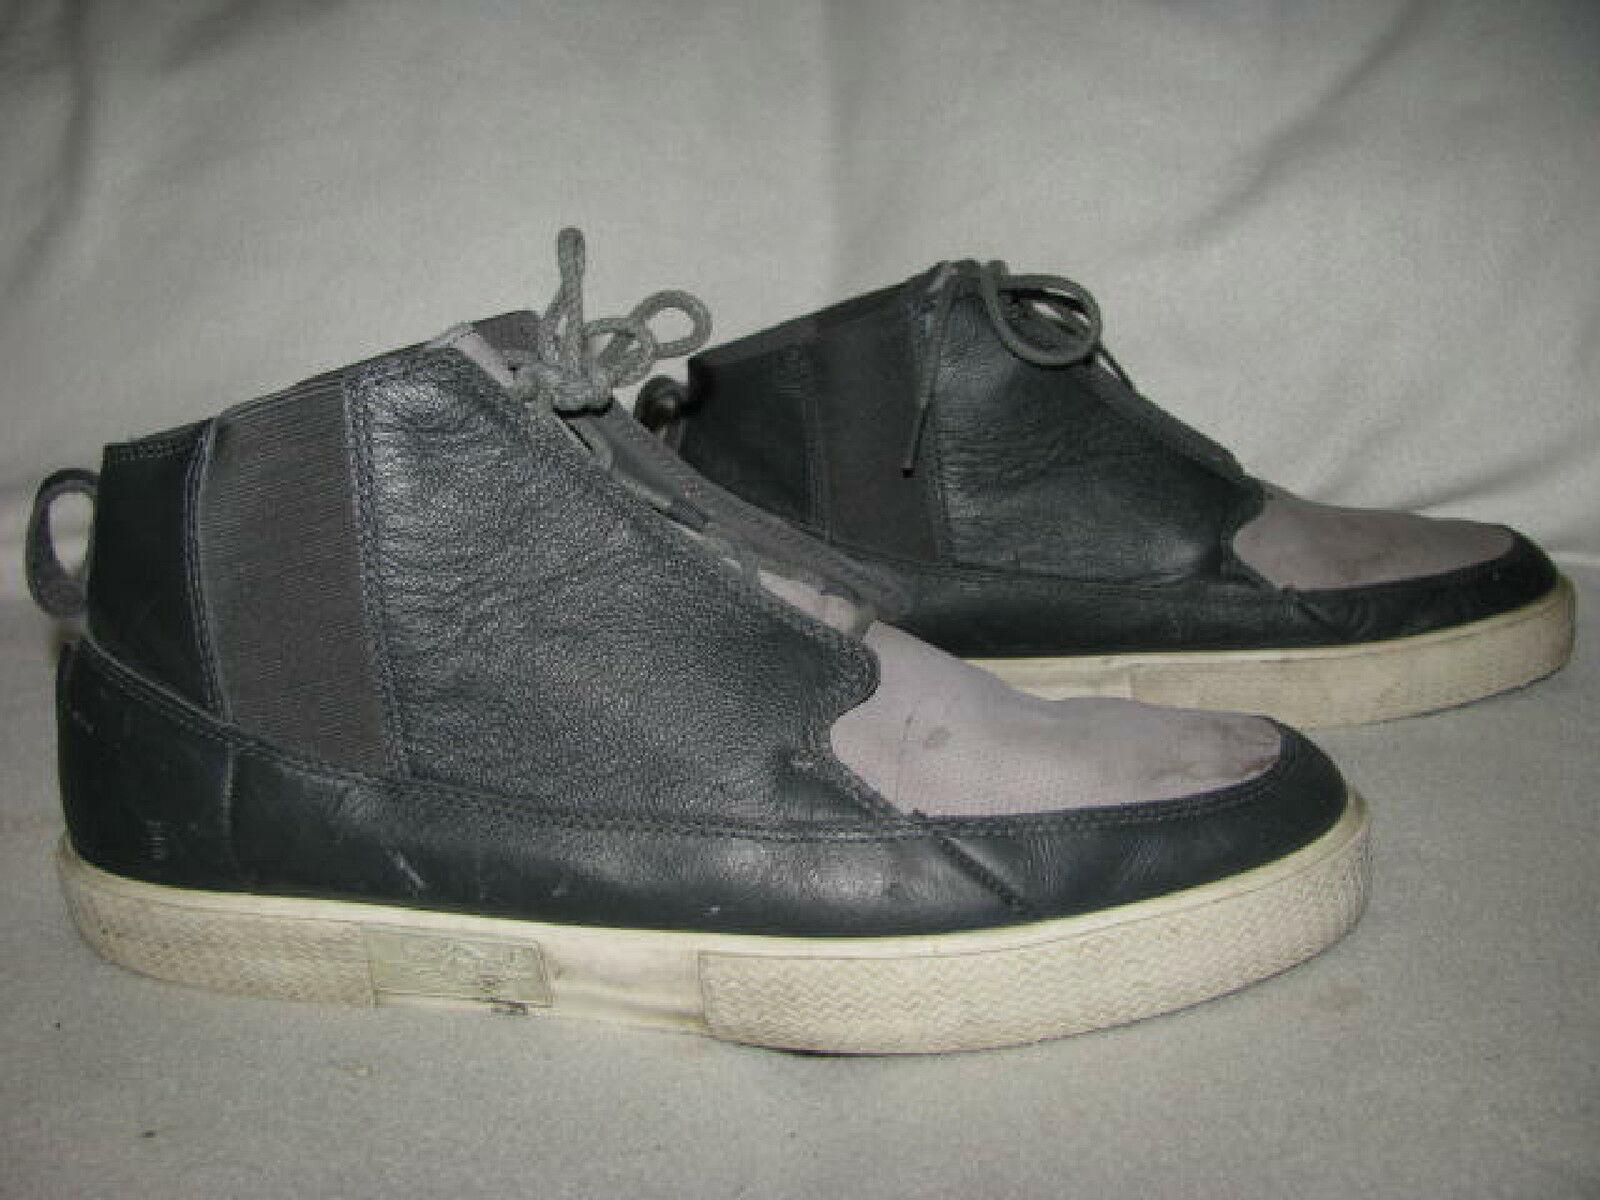 promo code 3b08b d5088 Nike Nike Nike Air JORDAN Men 13 Black Grey Leather Basketball Shoes  414174-012 3678a2